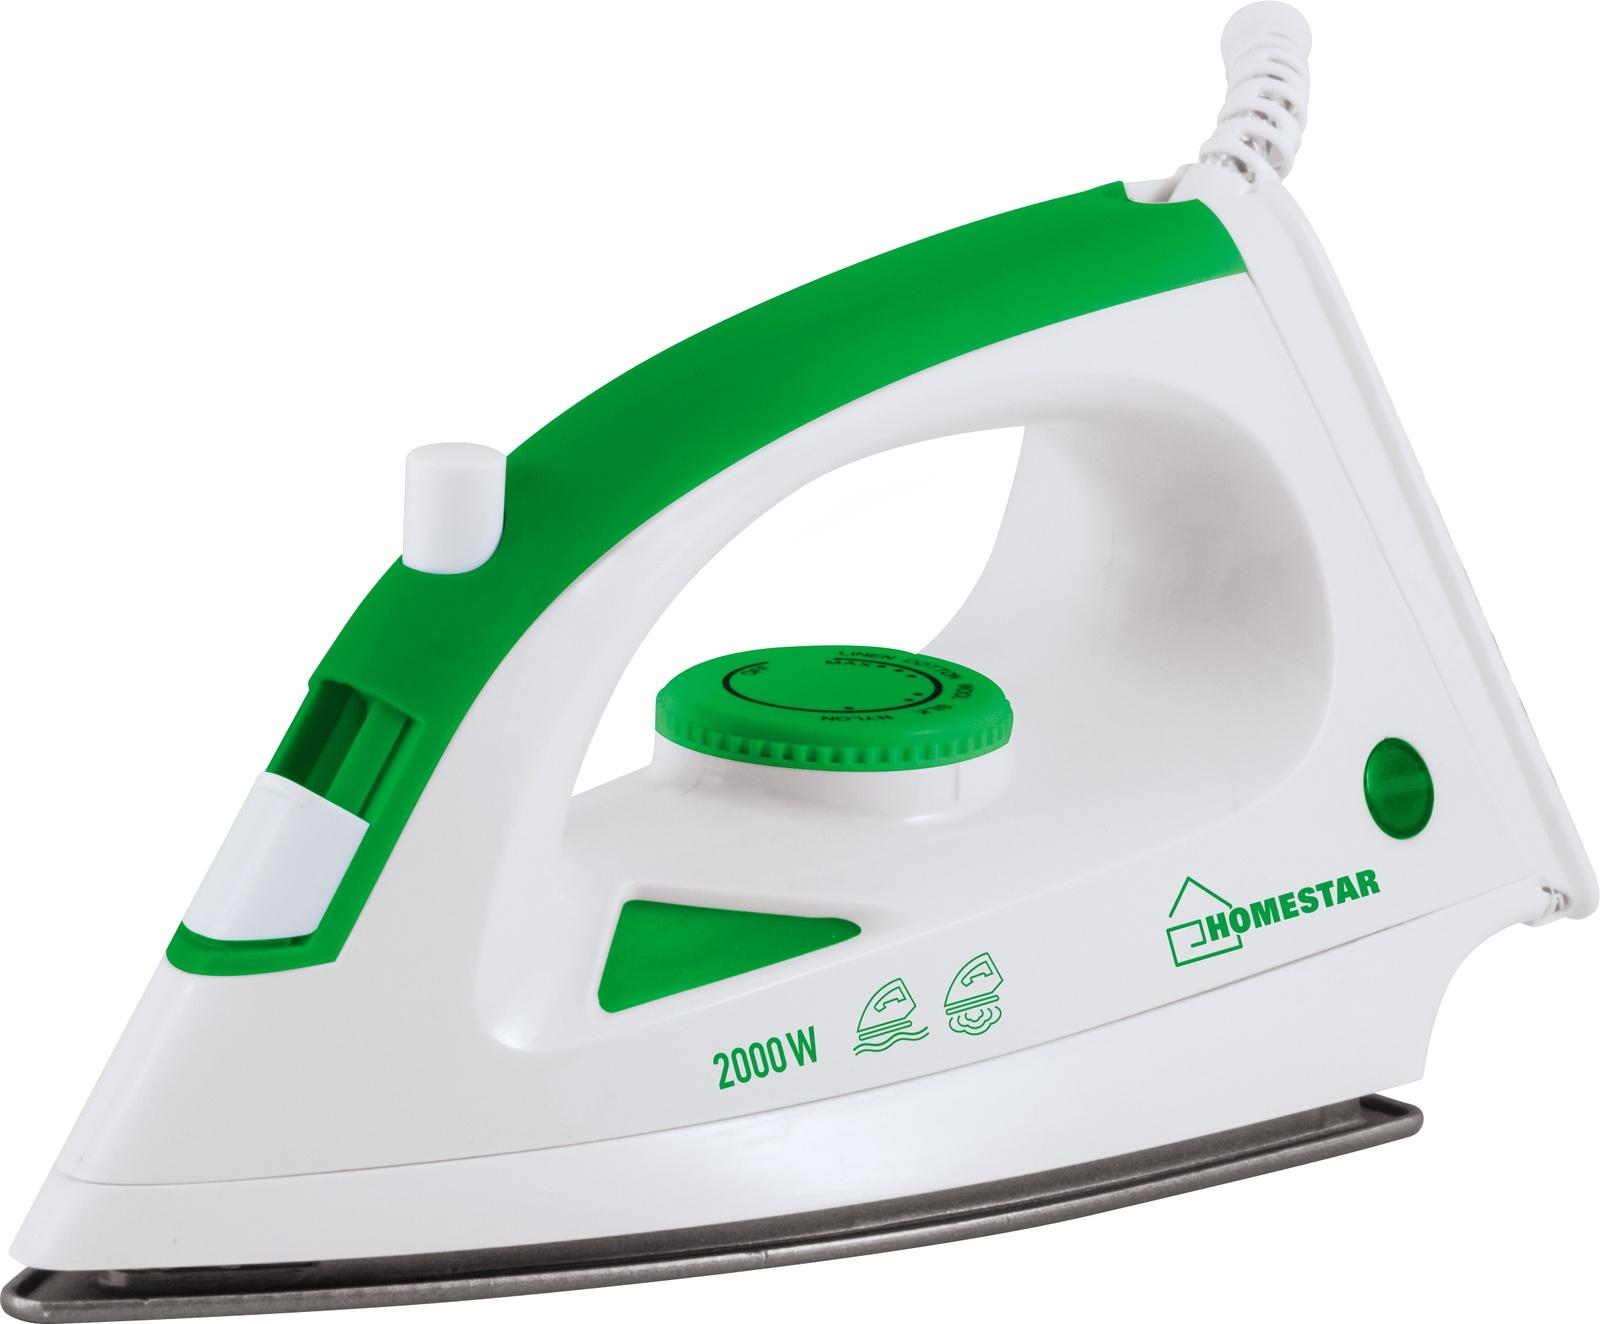 Утюг HOMESTAR HS-4001, 54 004837, белый, зеленый цены